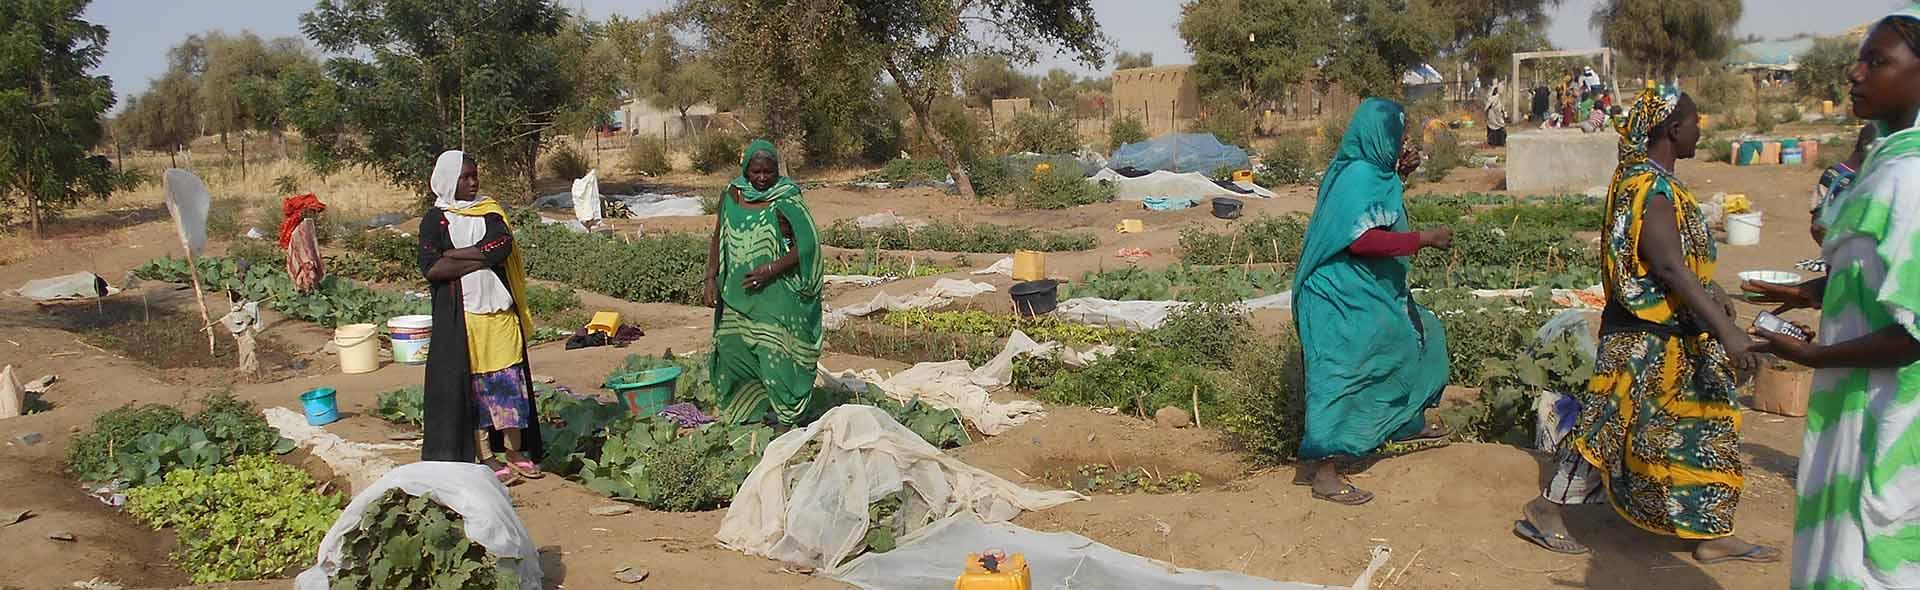 mauritania_perimetro agricola mujeres